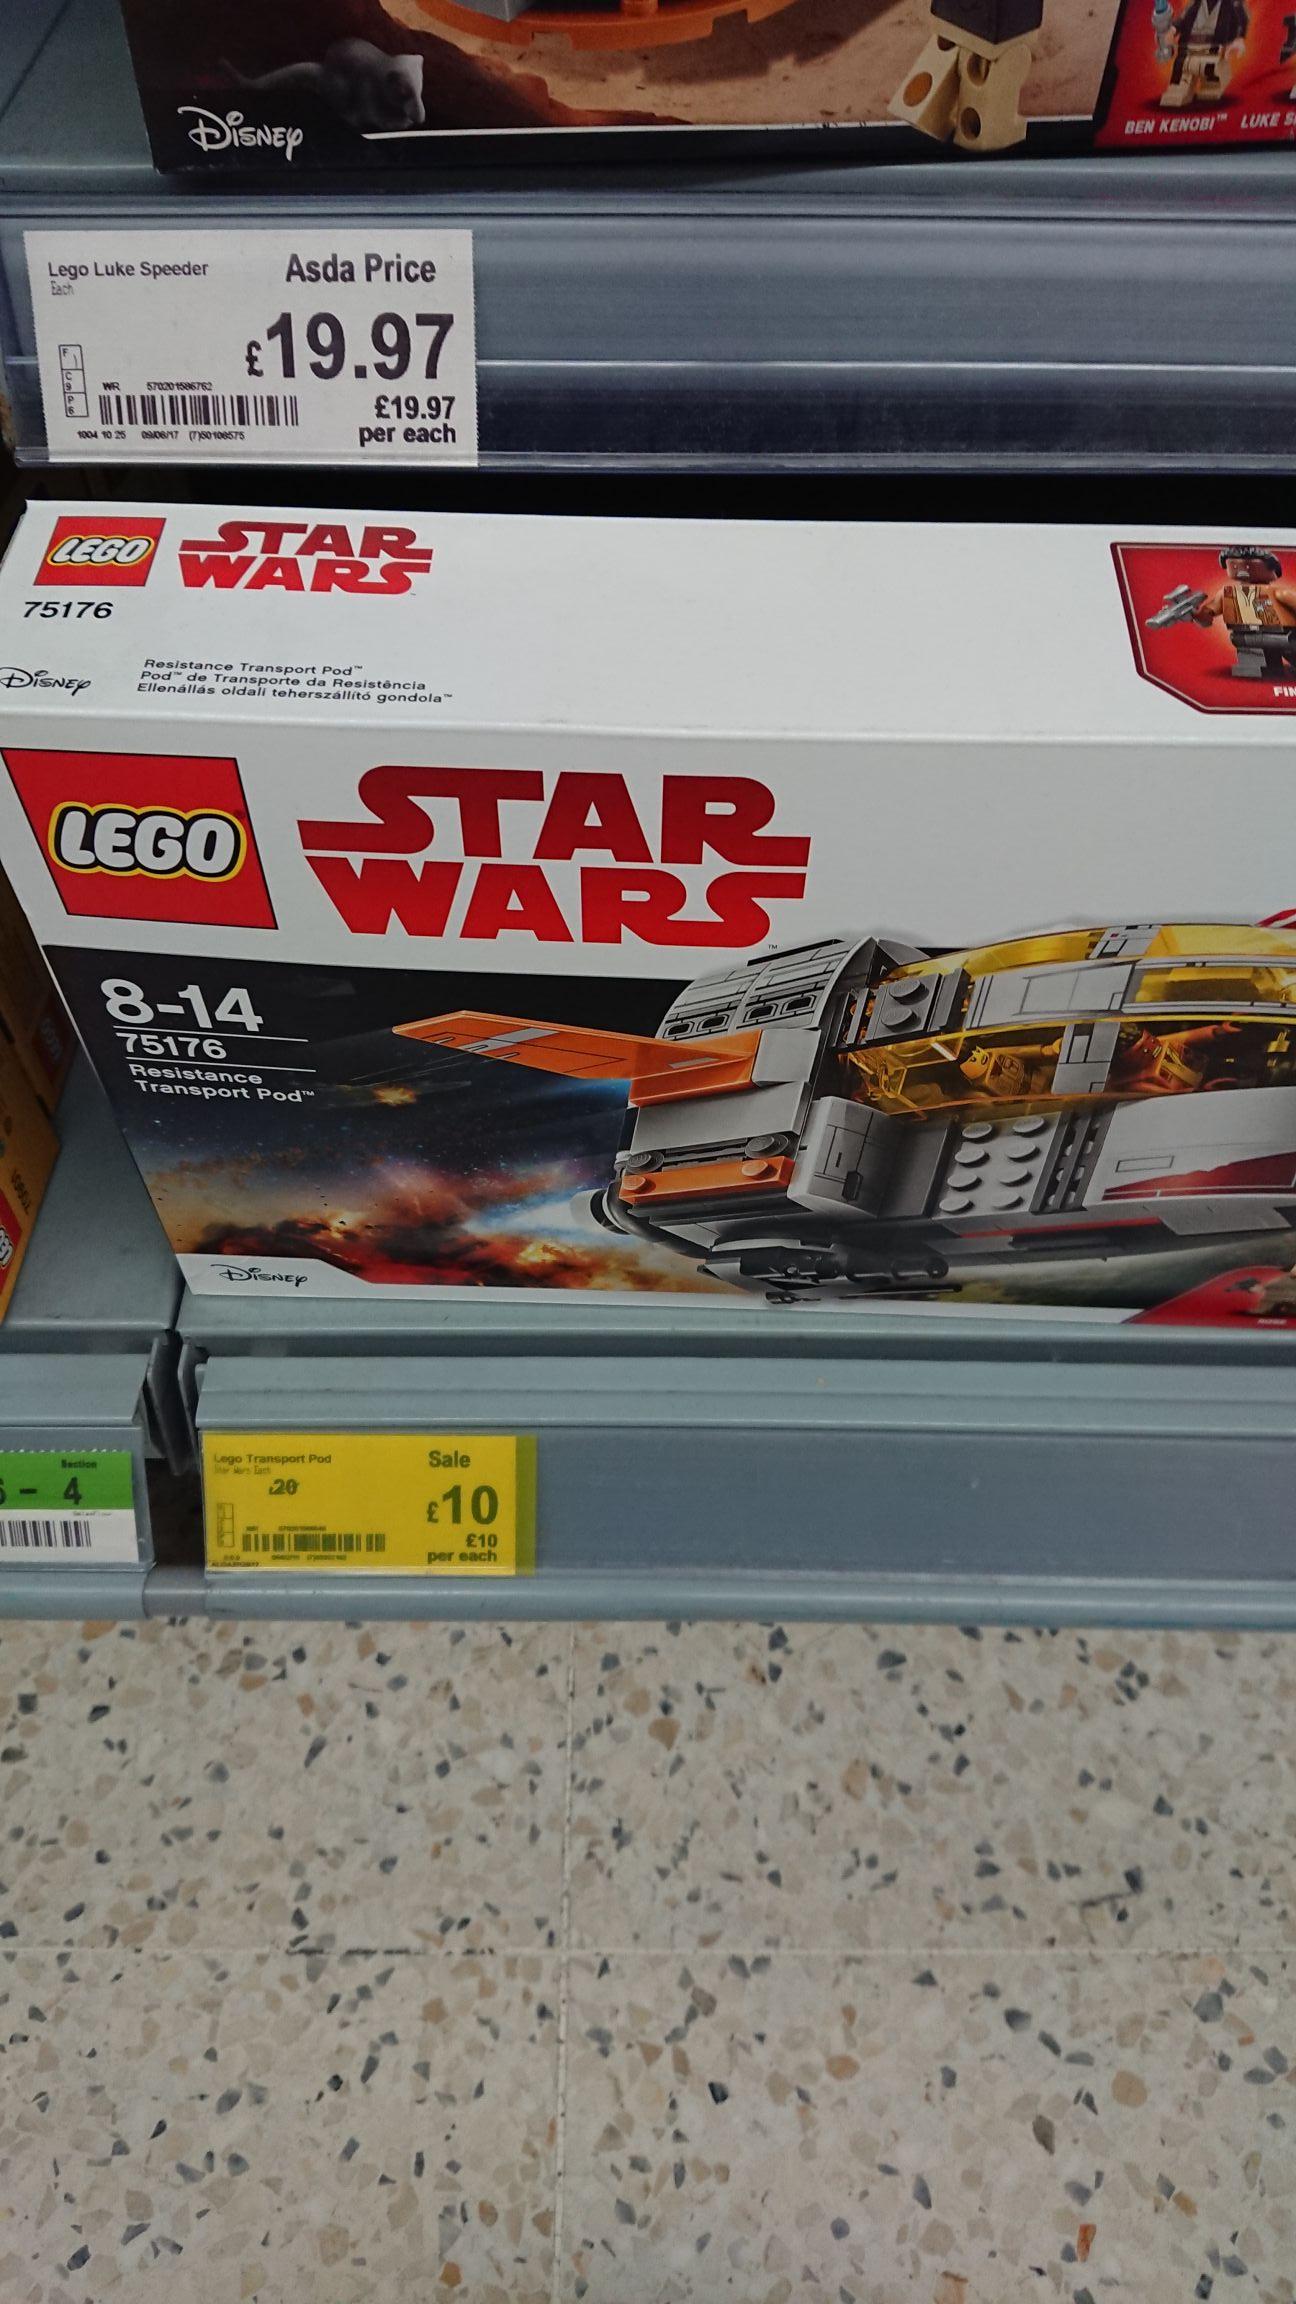 LEGO Star Wars resistance transport pod 75176 £10 instore @ Asda - Gateshead